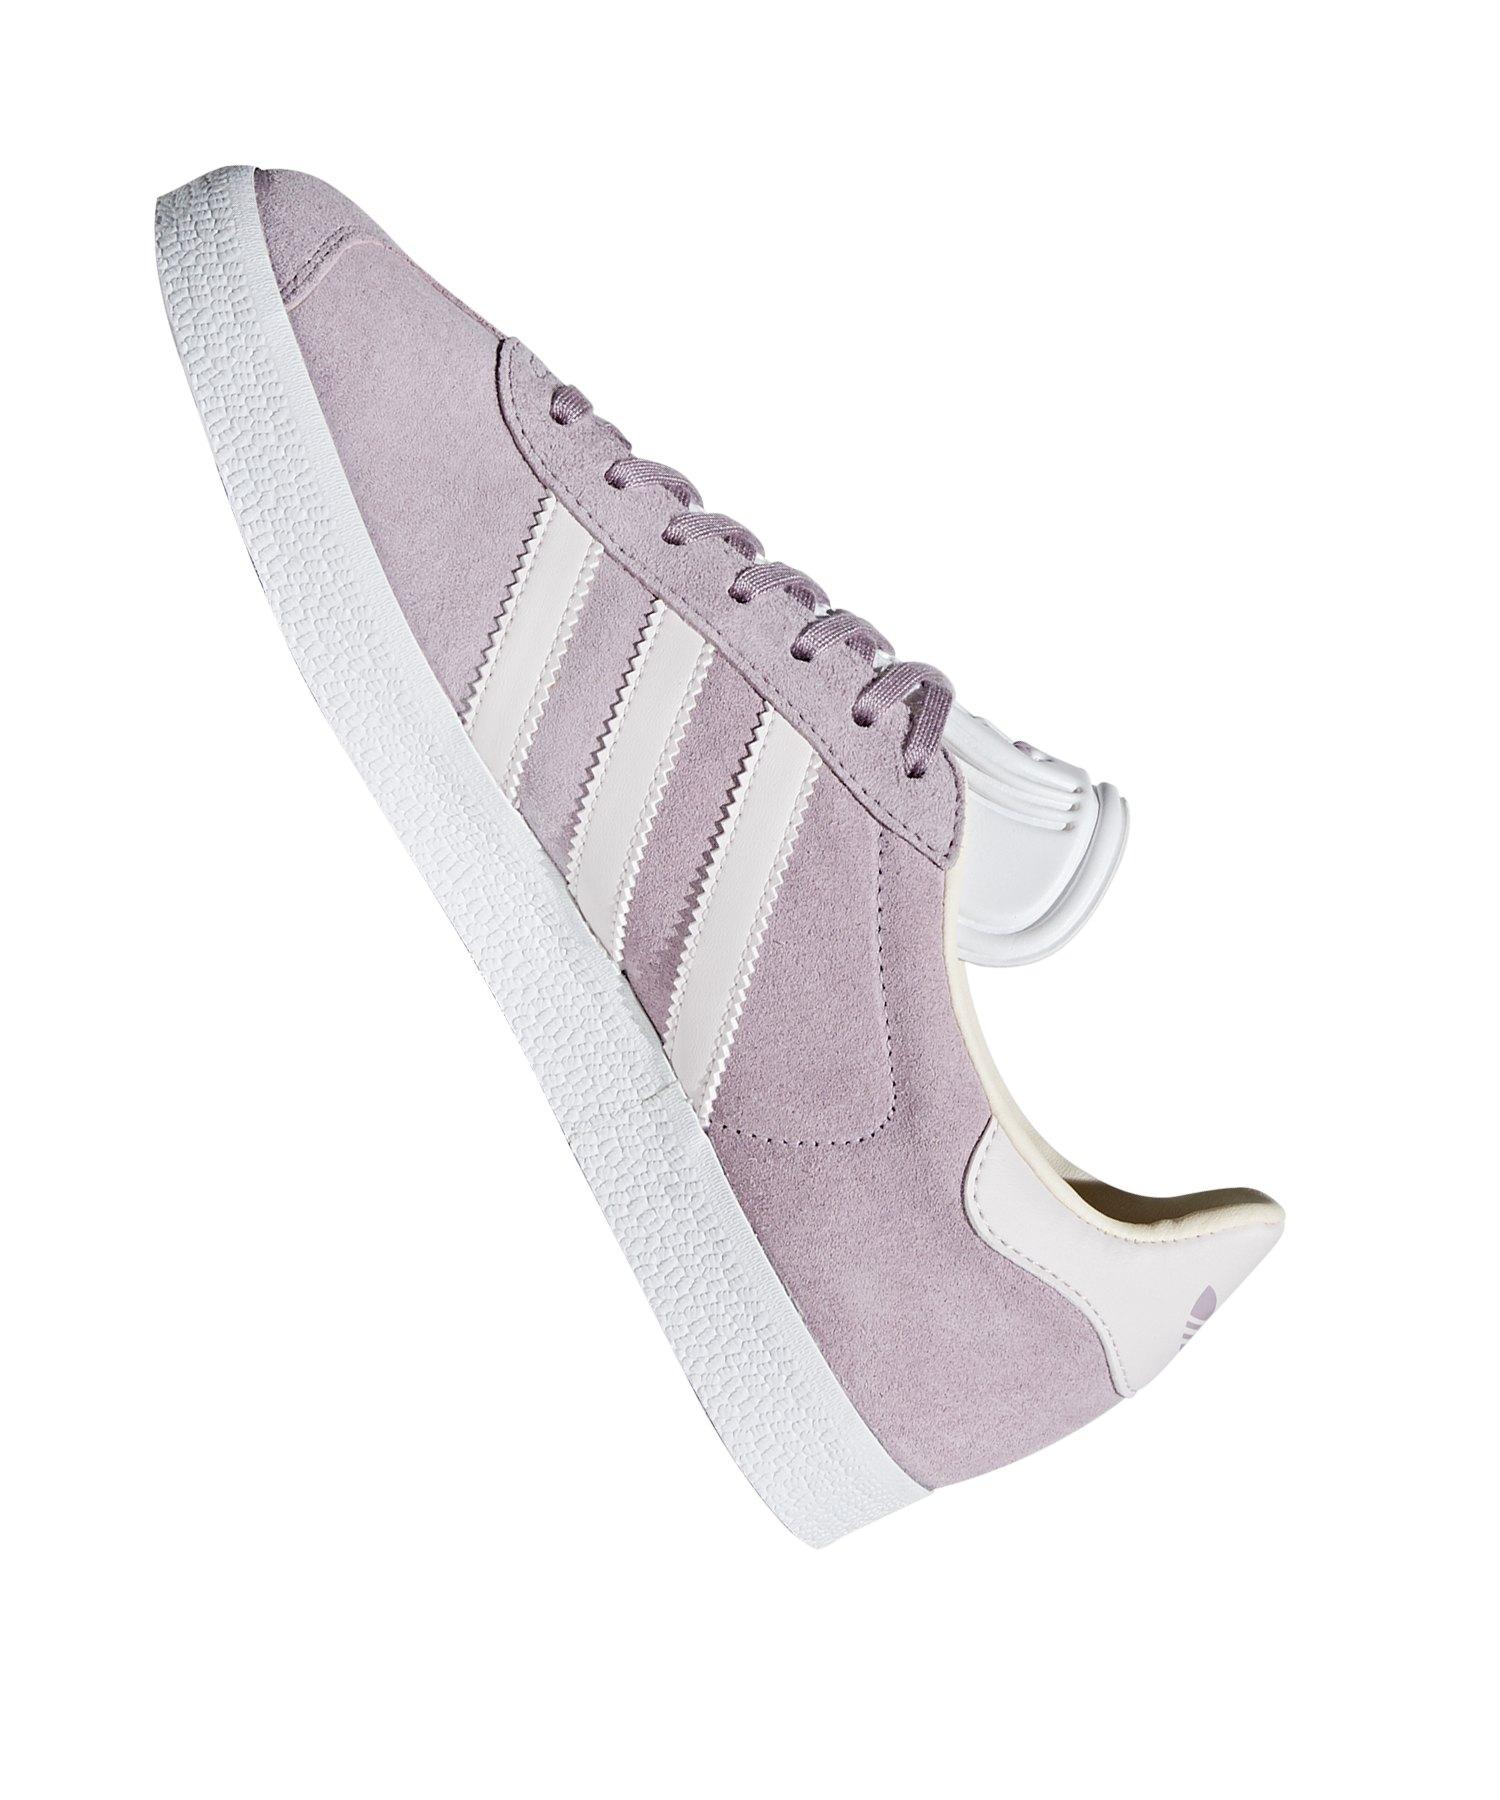 huge selection of b2228 b8504 ... adidas Originals Gazelle Sneaker Damen Grau Weiss - Grau ...